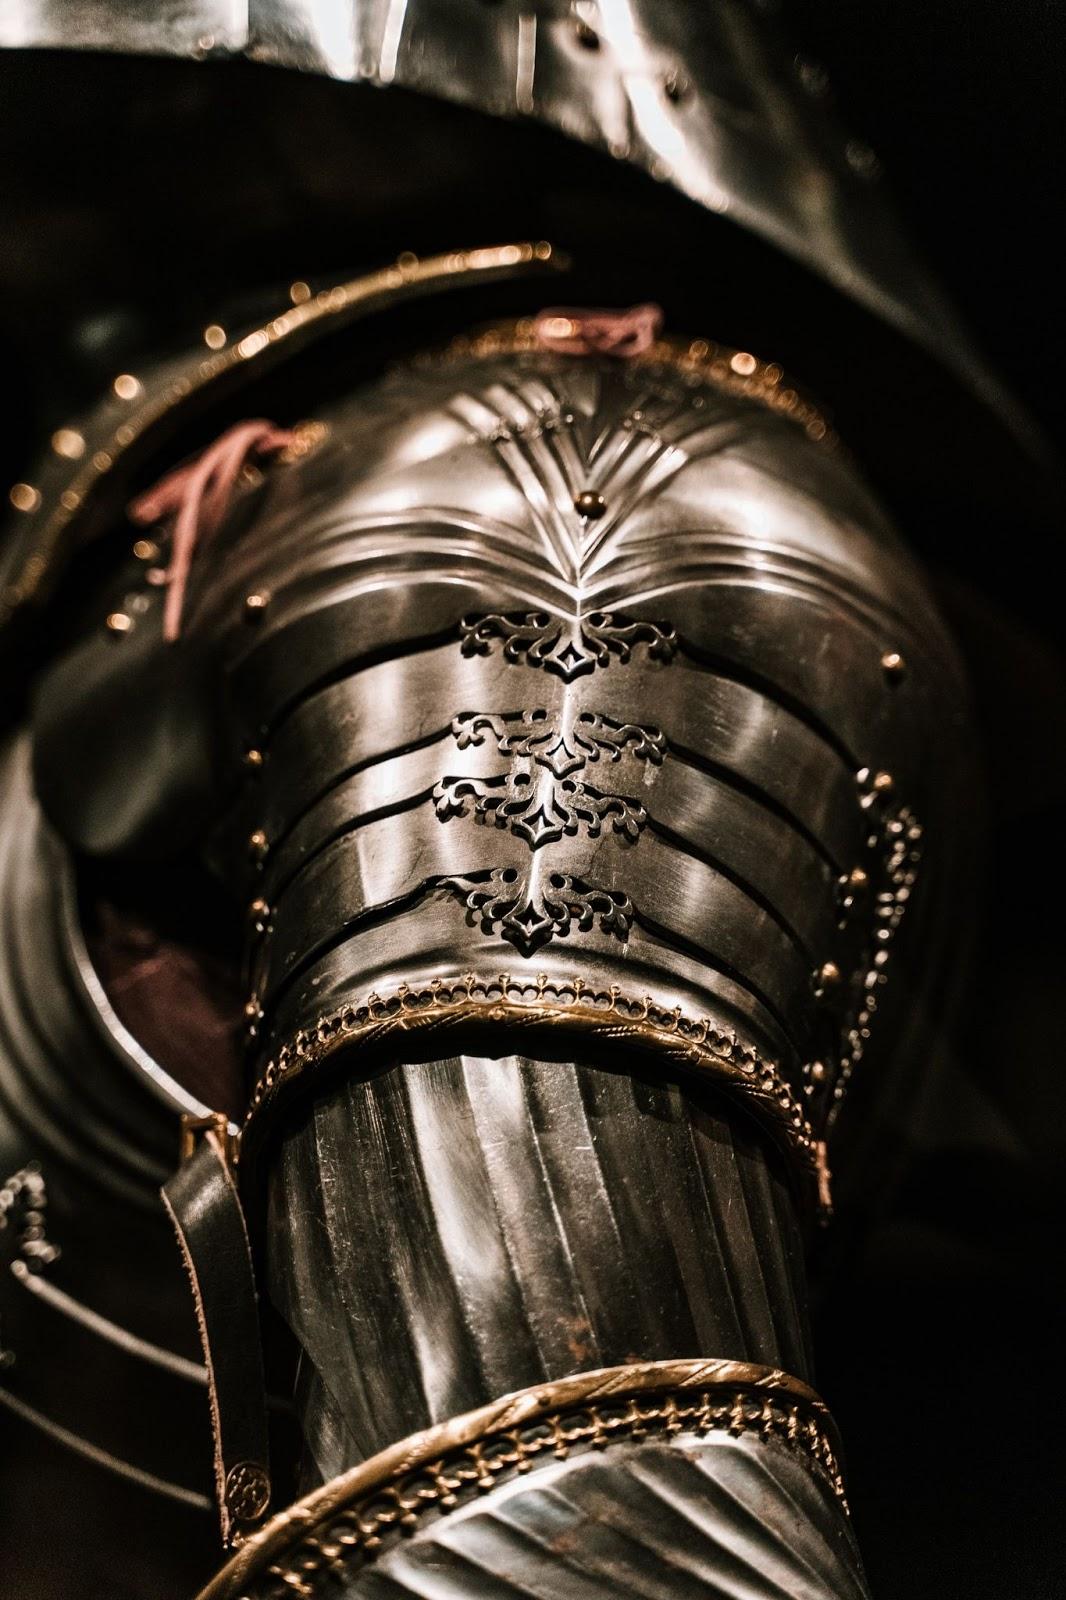 close up of a shoulder piece of armor